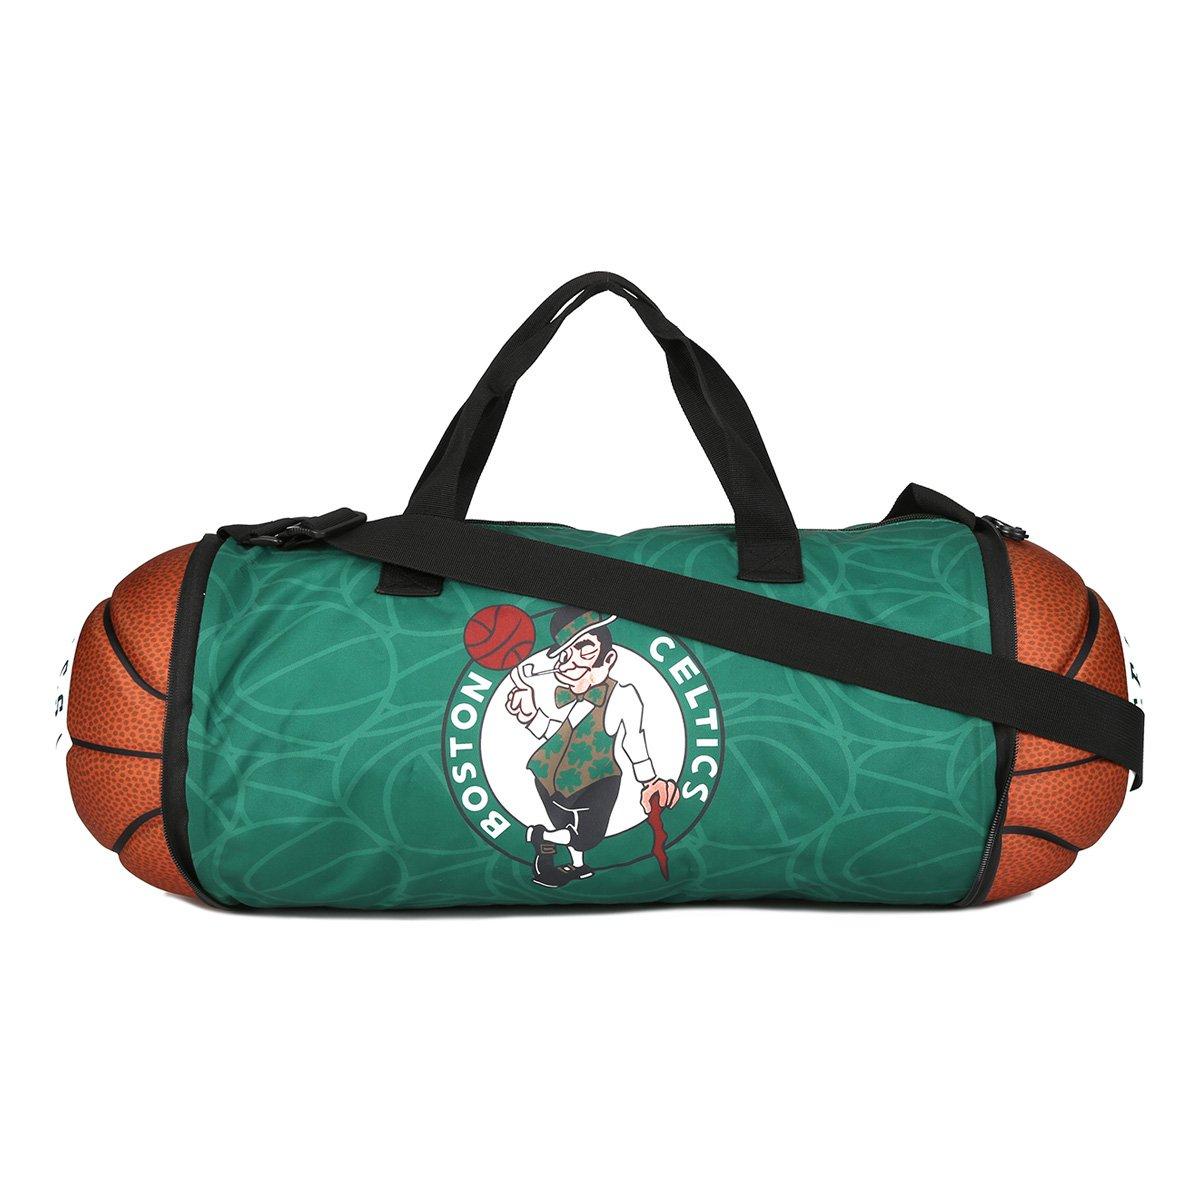 Nba Boston Celtics BagLoja Bolsa Ball XZiwkuOPT